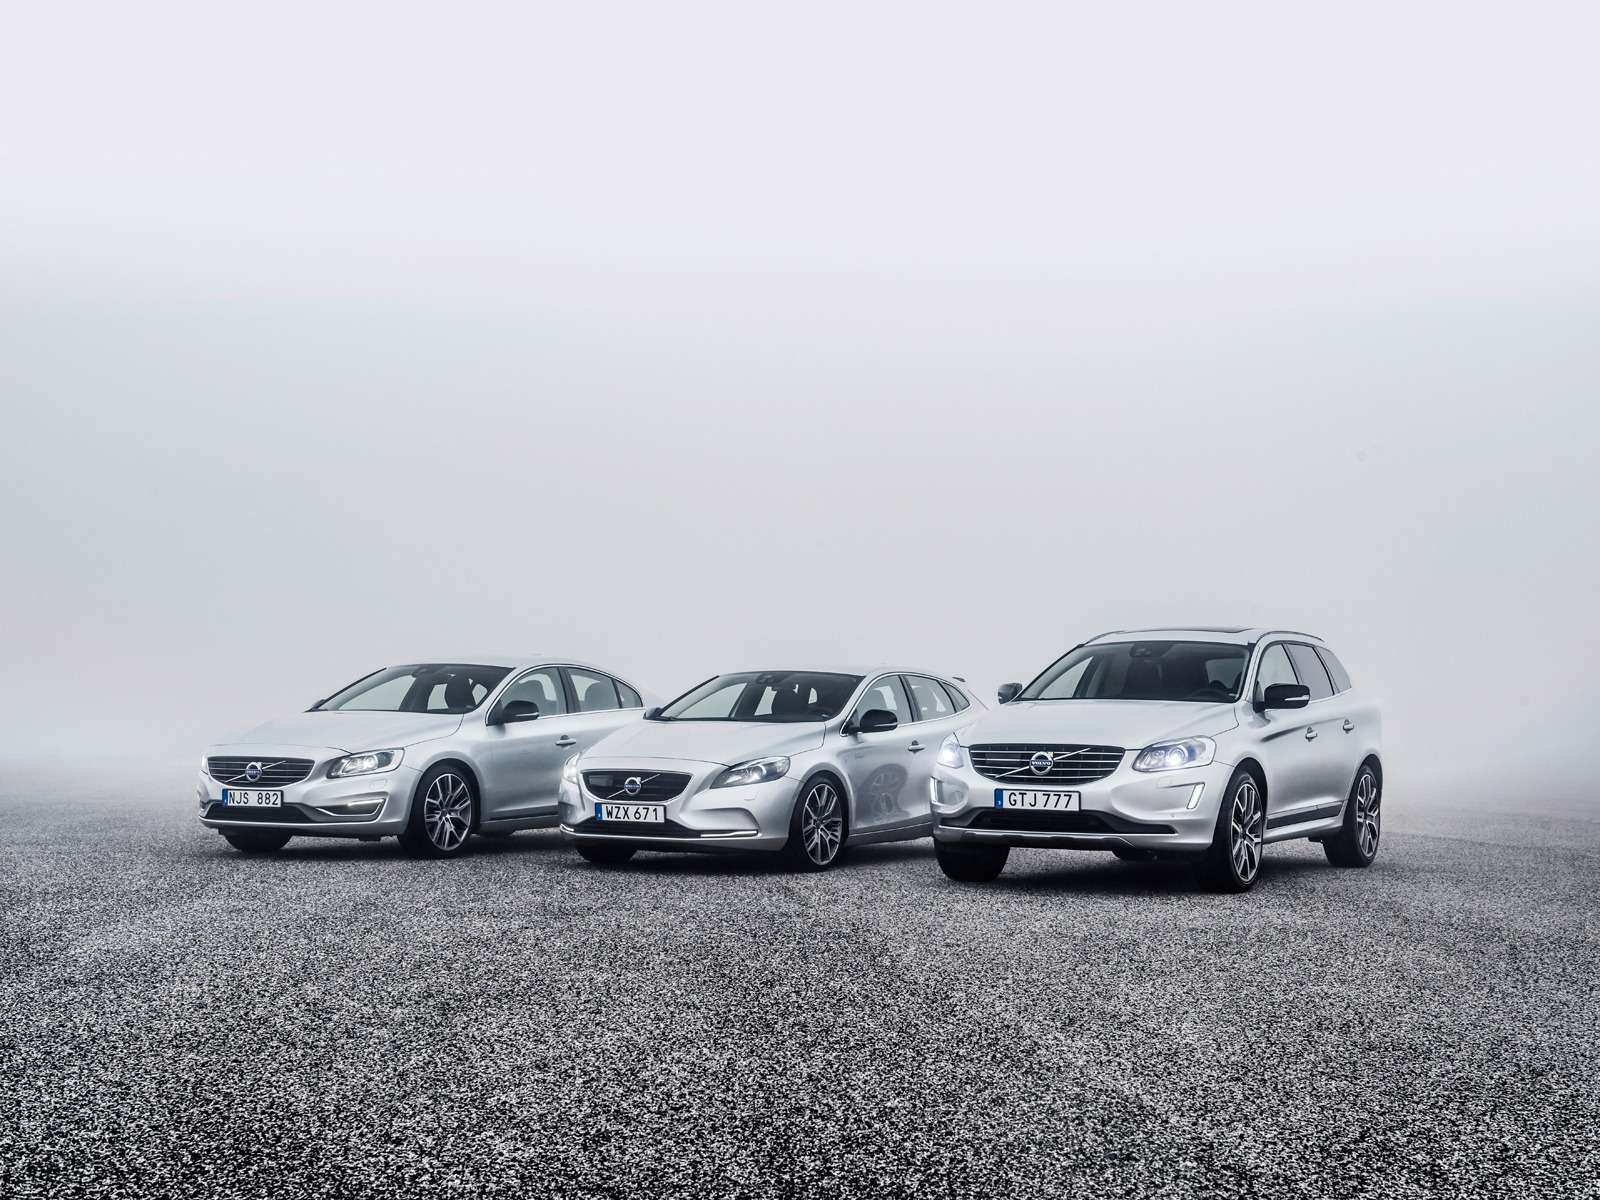 Volvo соспециями: дегустируем спортпакет Polestar— фото 586610